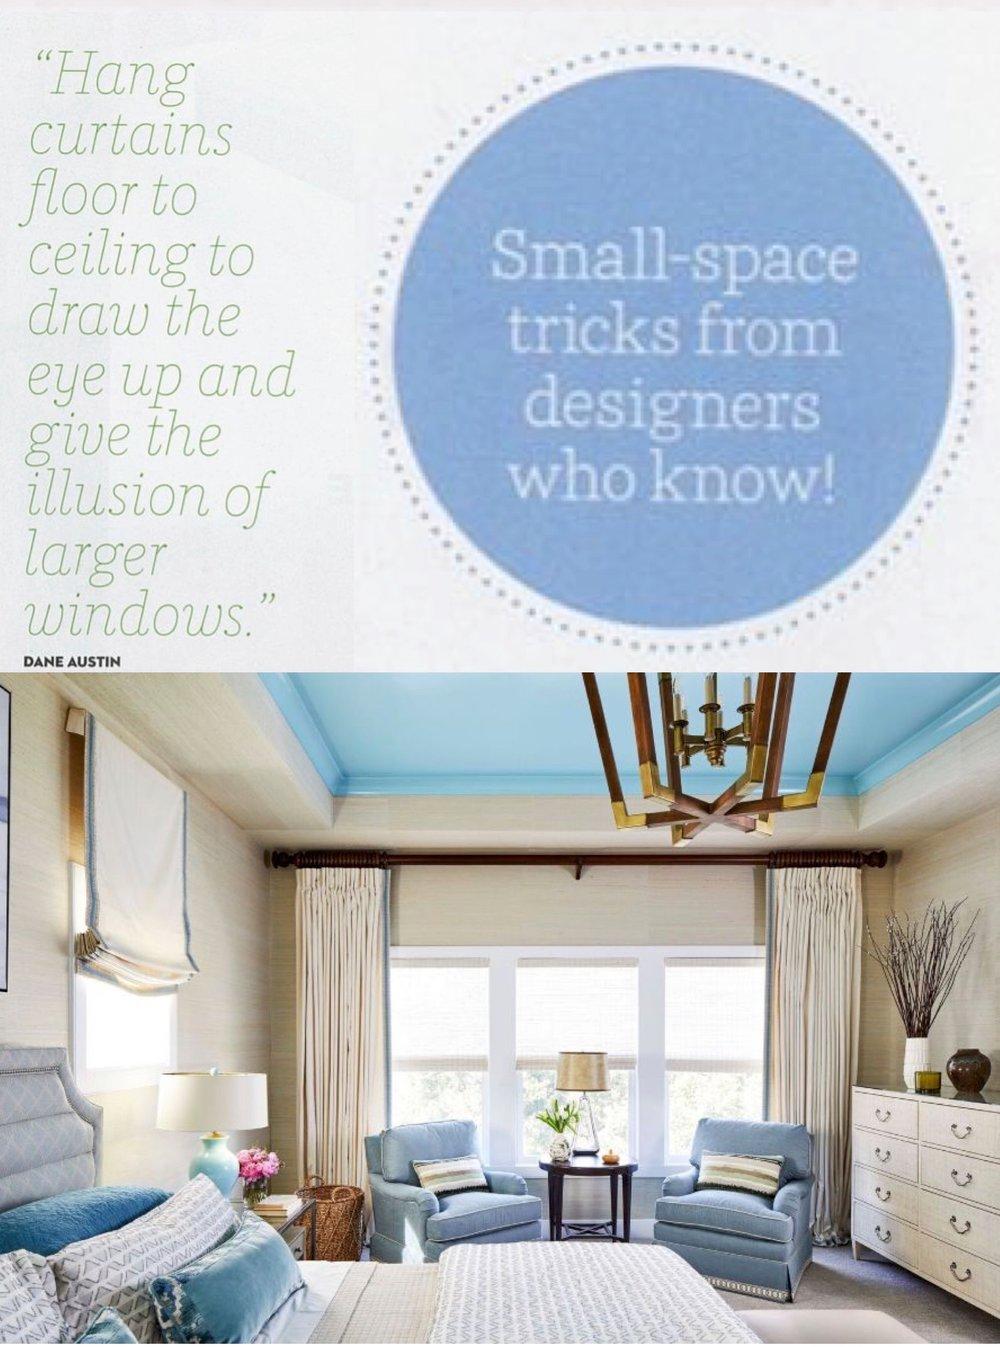 Boston+Cambridge+Interior+Designer+Dane+Austin+Design+House+Beautiful+June+2018+3.jpg